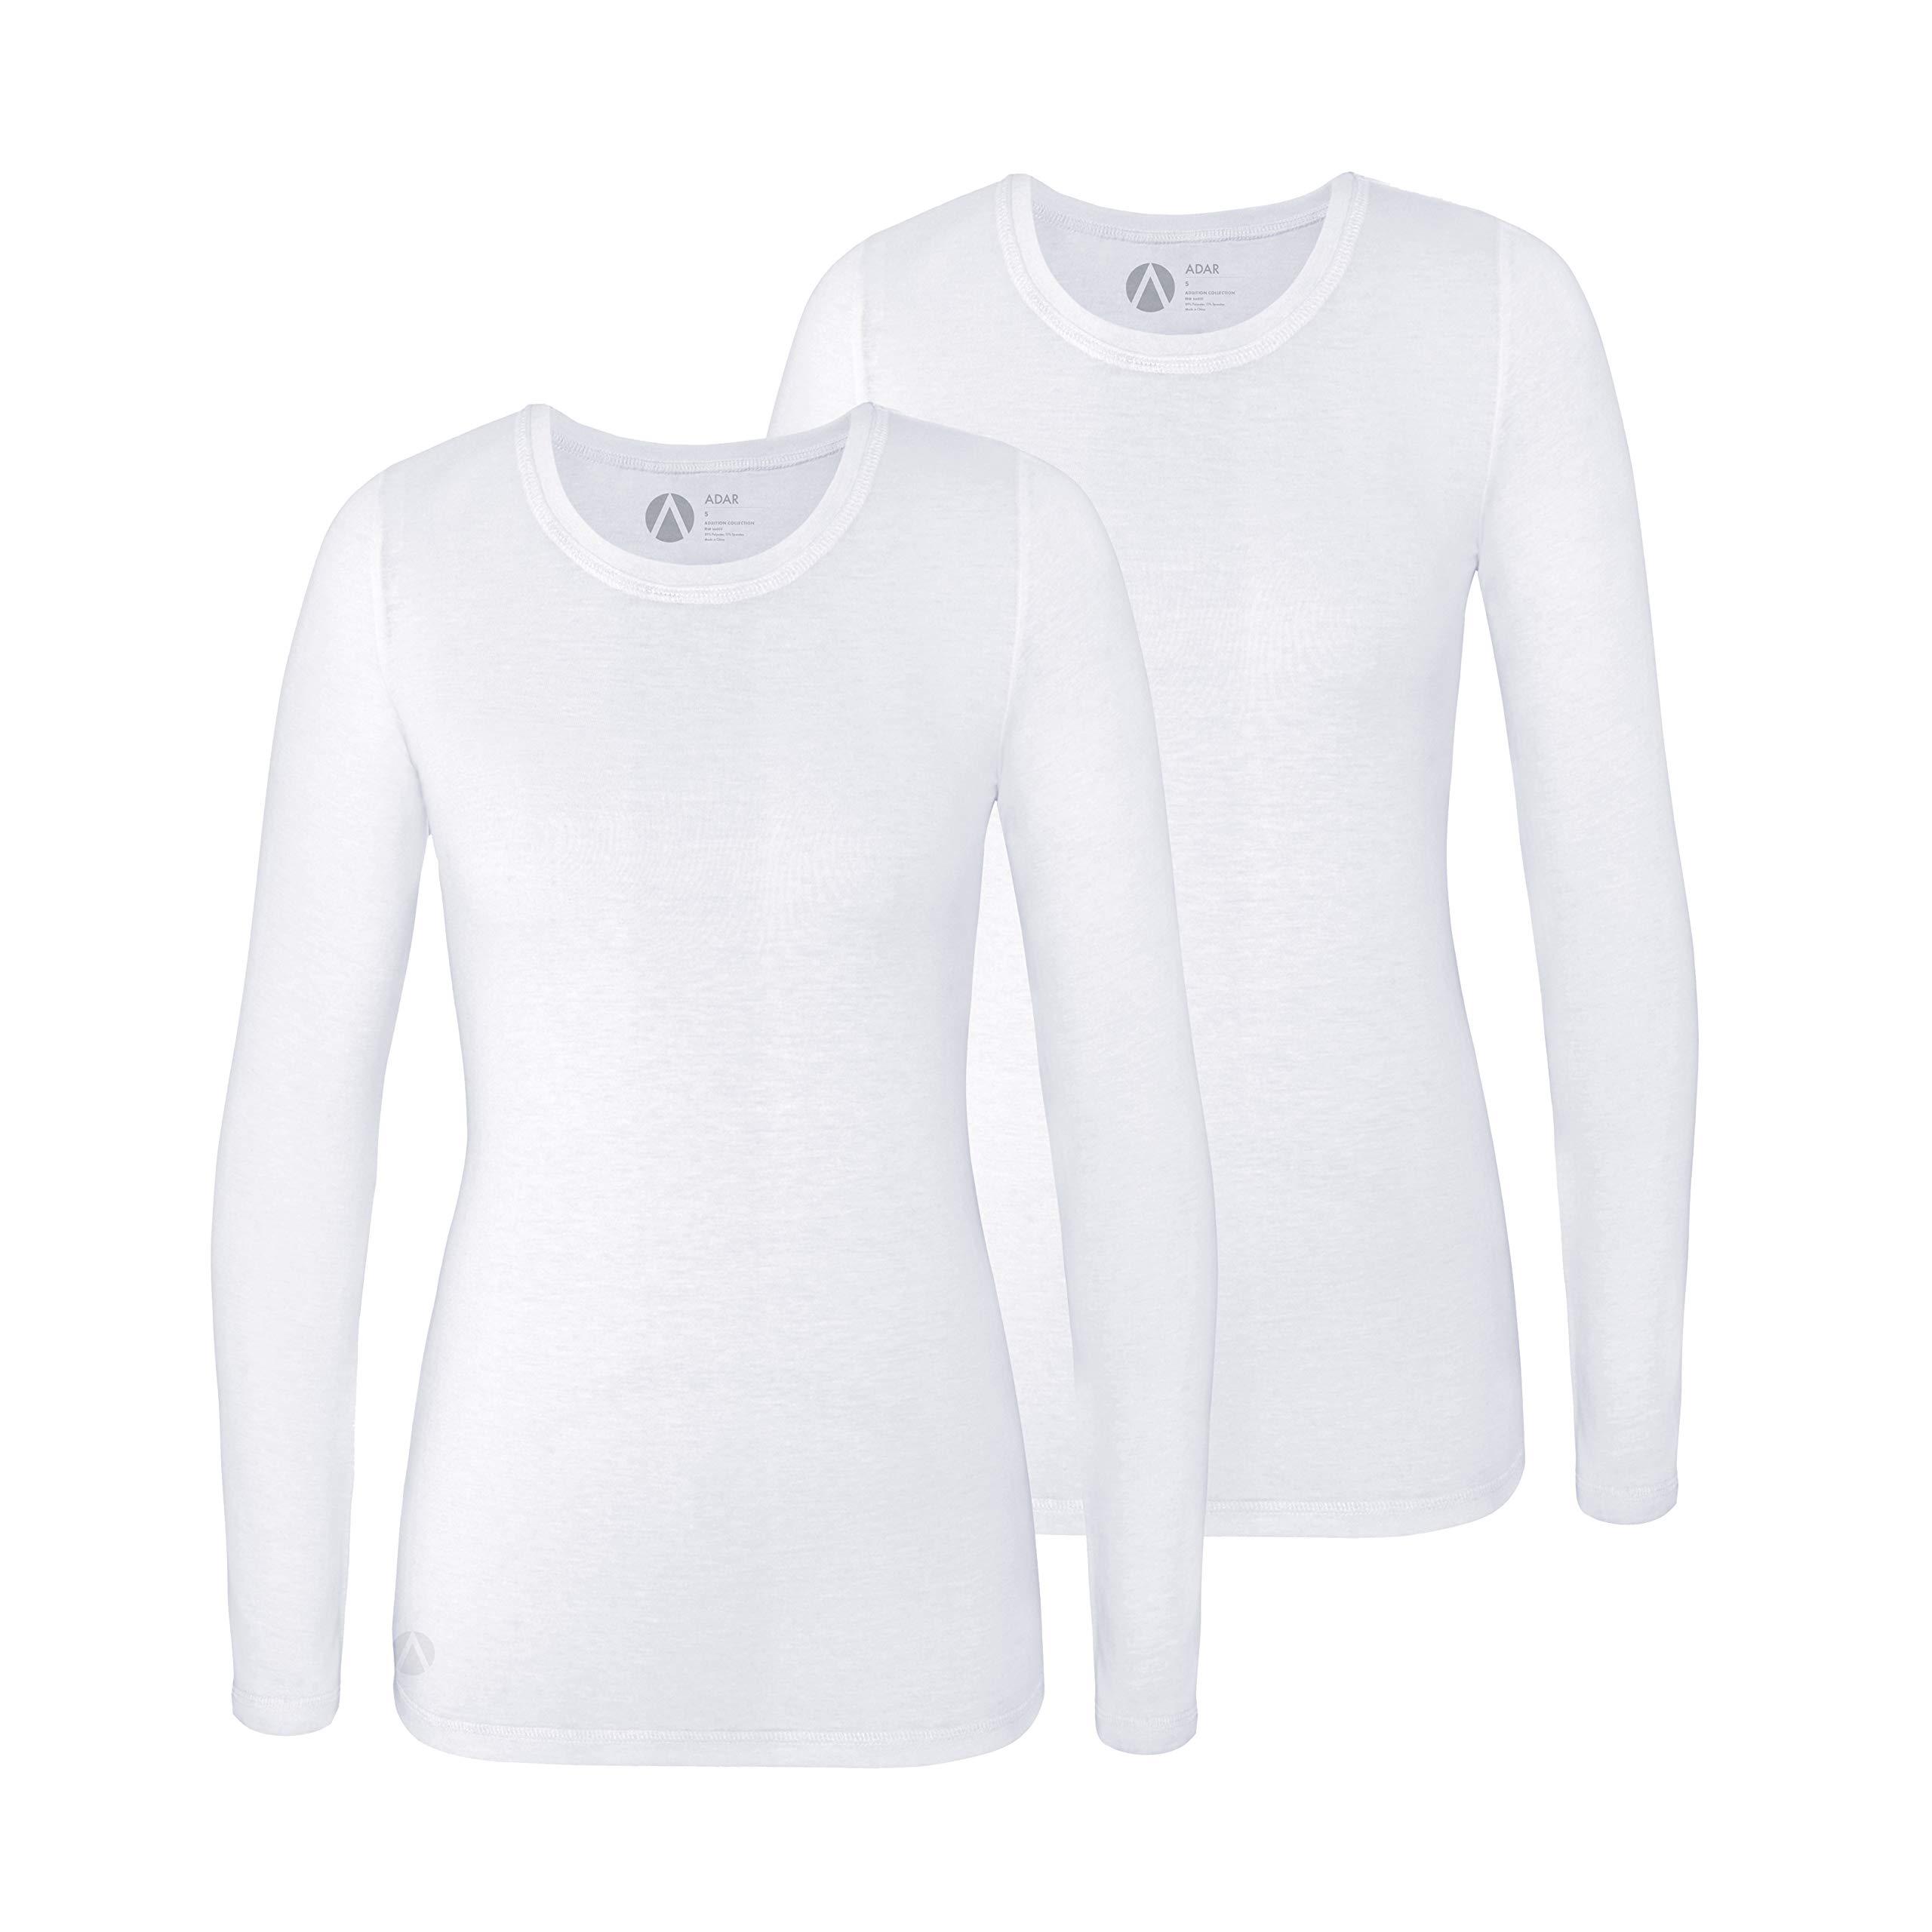 Adar Underscrub Tee 2 Pack for Women - Long Sleeve Fitted Underscrubs